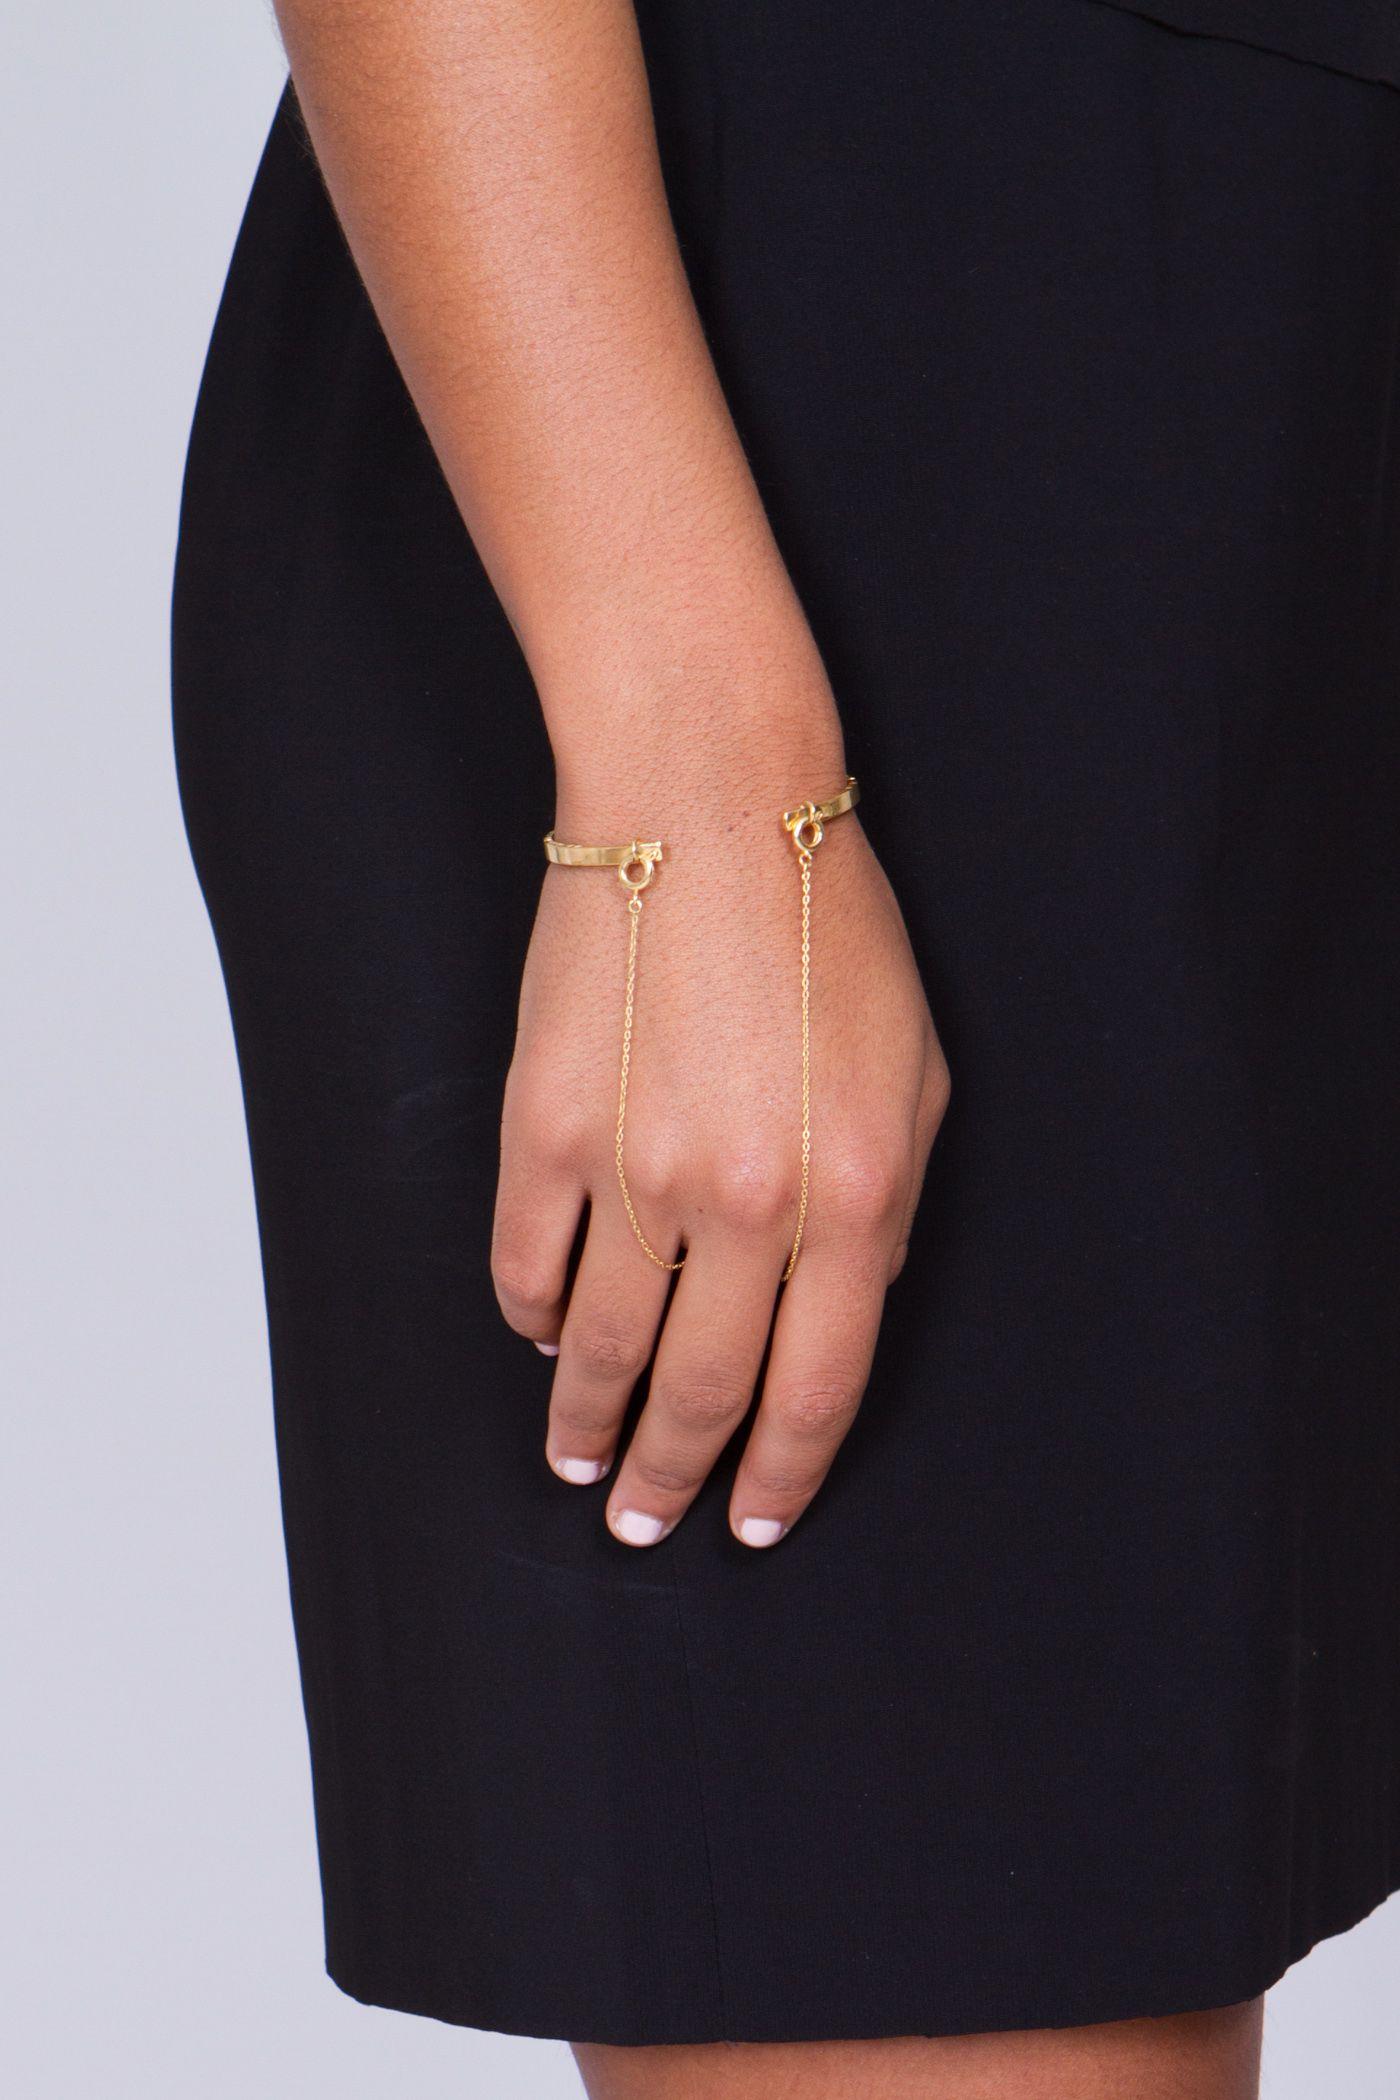 Slized Bracelet \'Wrist to Finger\'︱Gold Plated Brass︱By designer ...